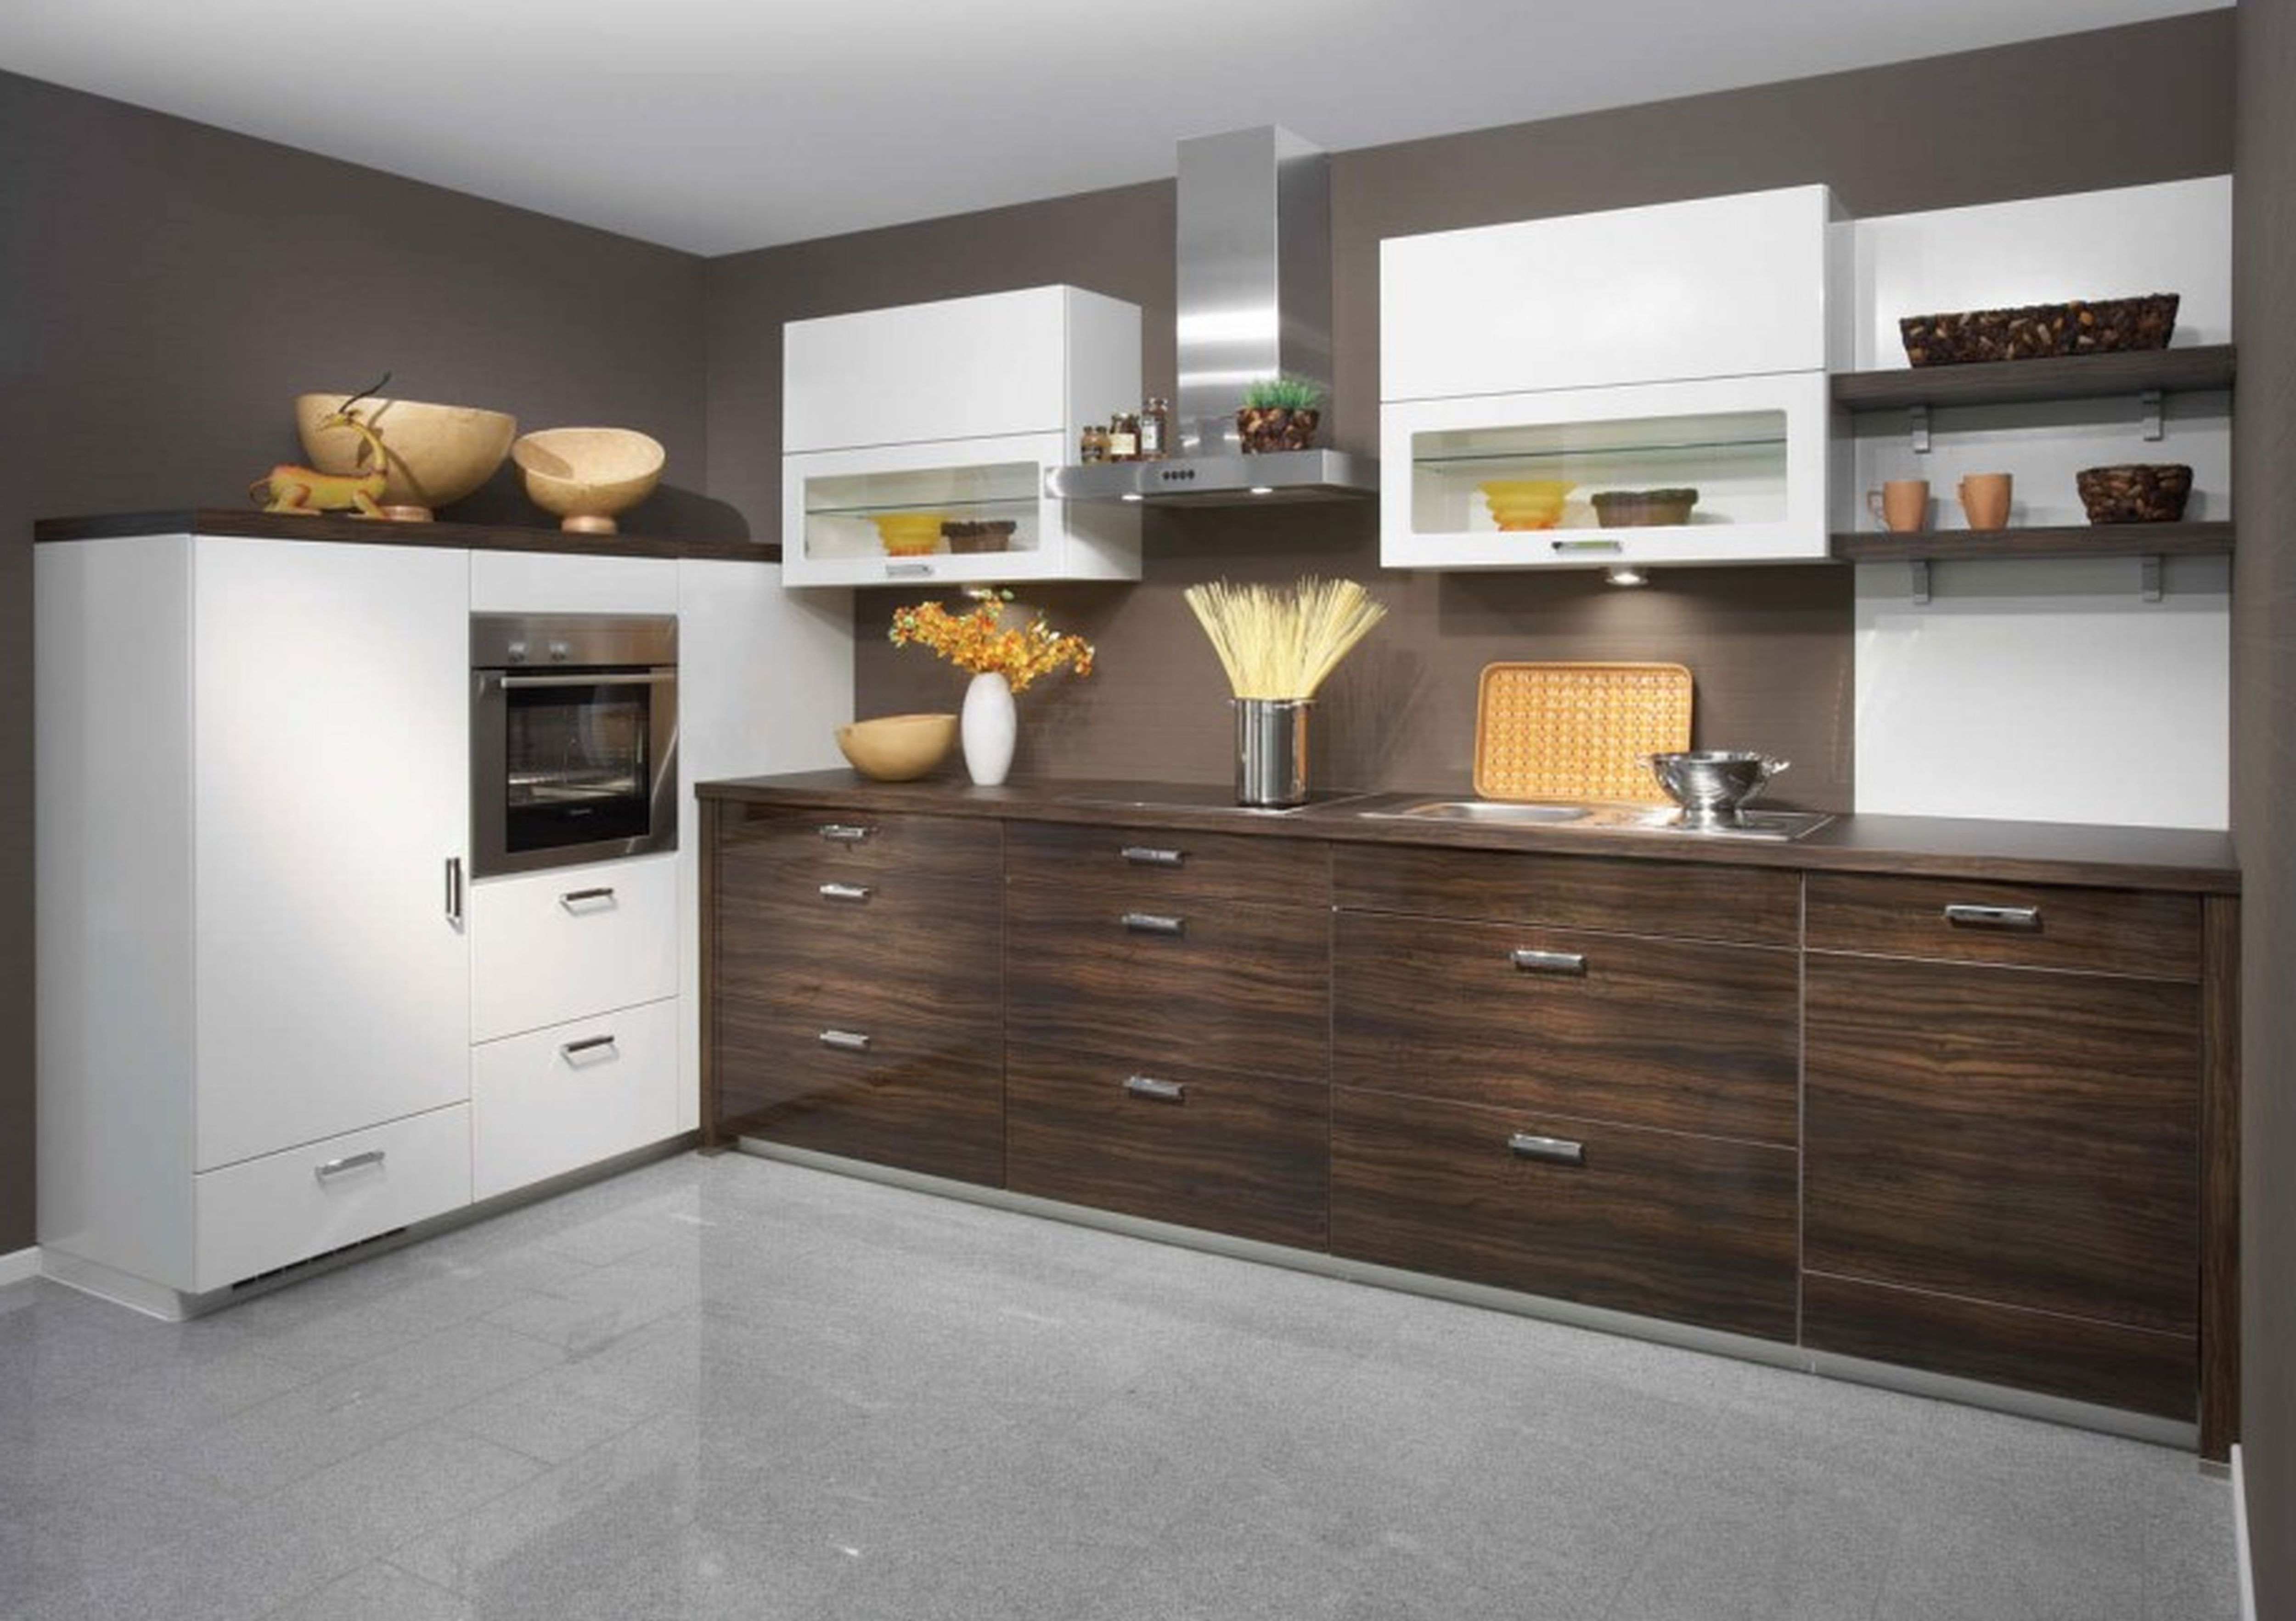 fantastic kitchen designs - Google Search | Nội thất nhà ...